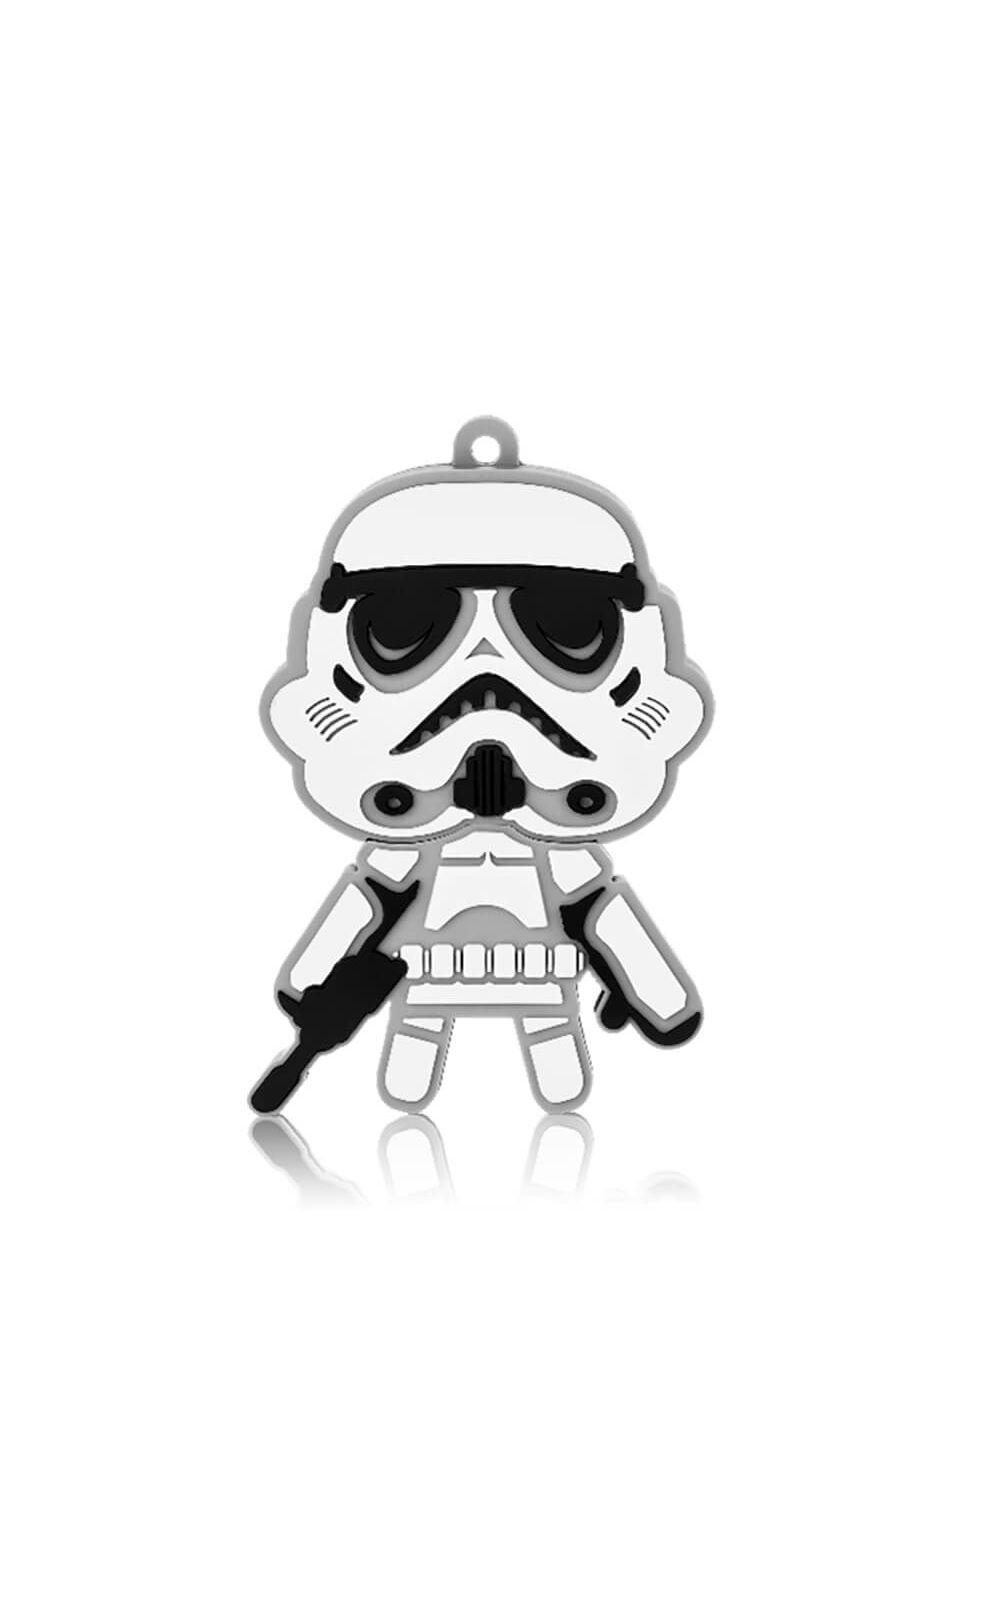 Foto 1 - Pen Drive Star Wars Stormtrooper 8GB USB Leitura 10MB/s e Gravação 3MB/s Multilaser - PD039